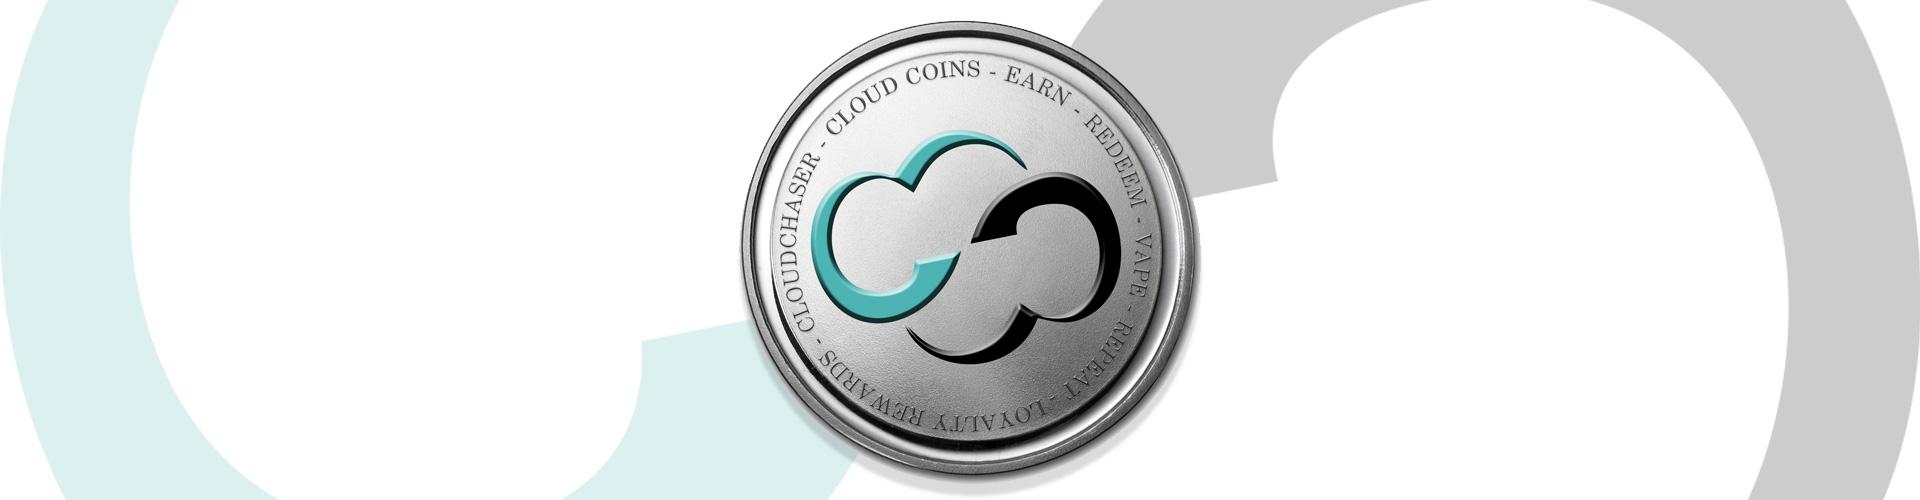 Cloudchaser Rewards